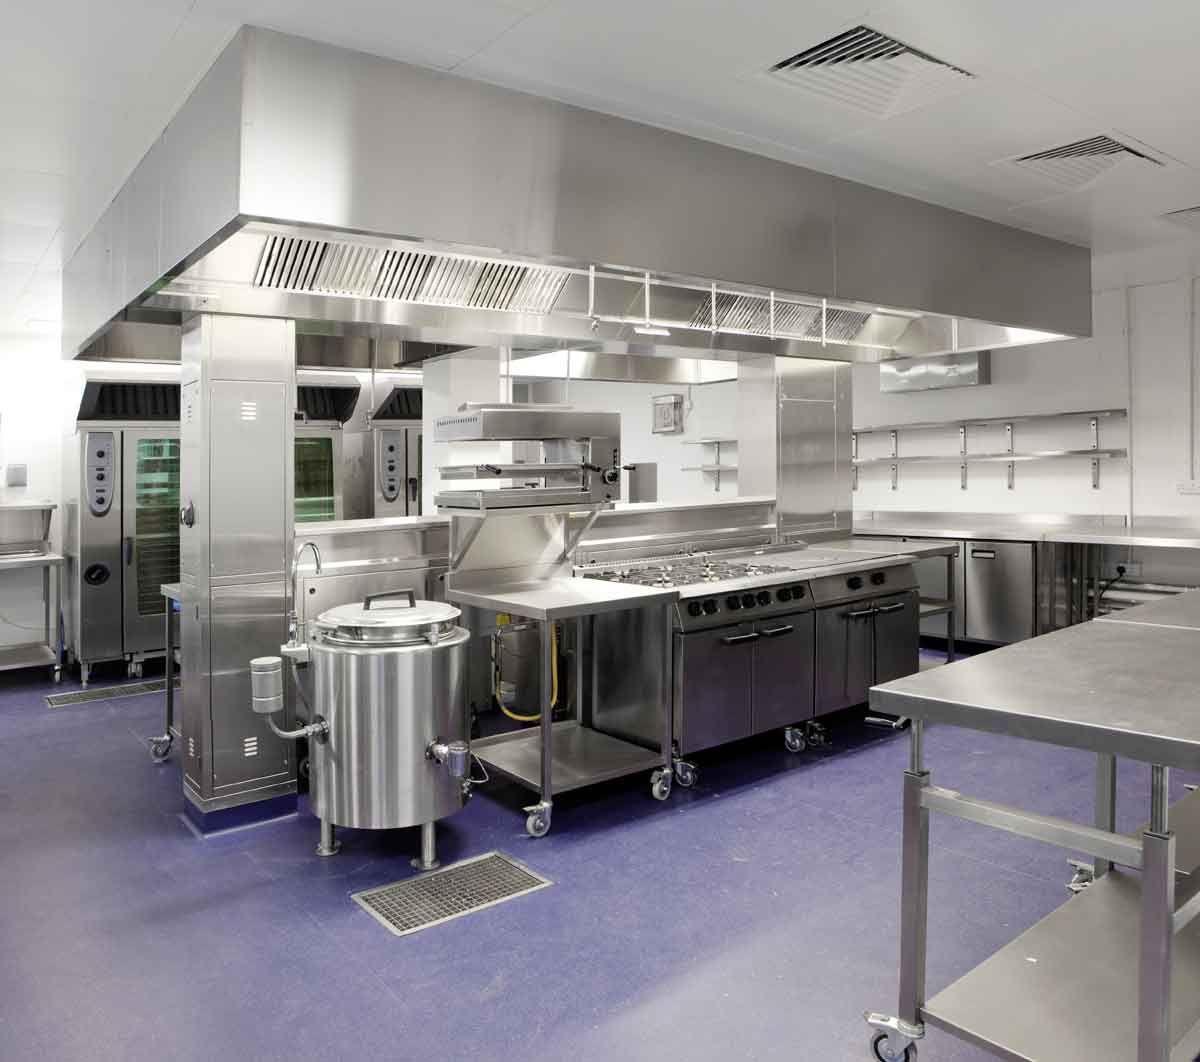 Stainless Steel Commercial Kitchen - zitzat.com | Restaurant ...